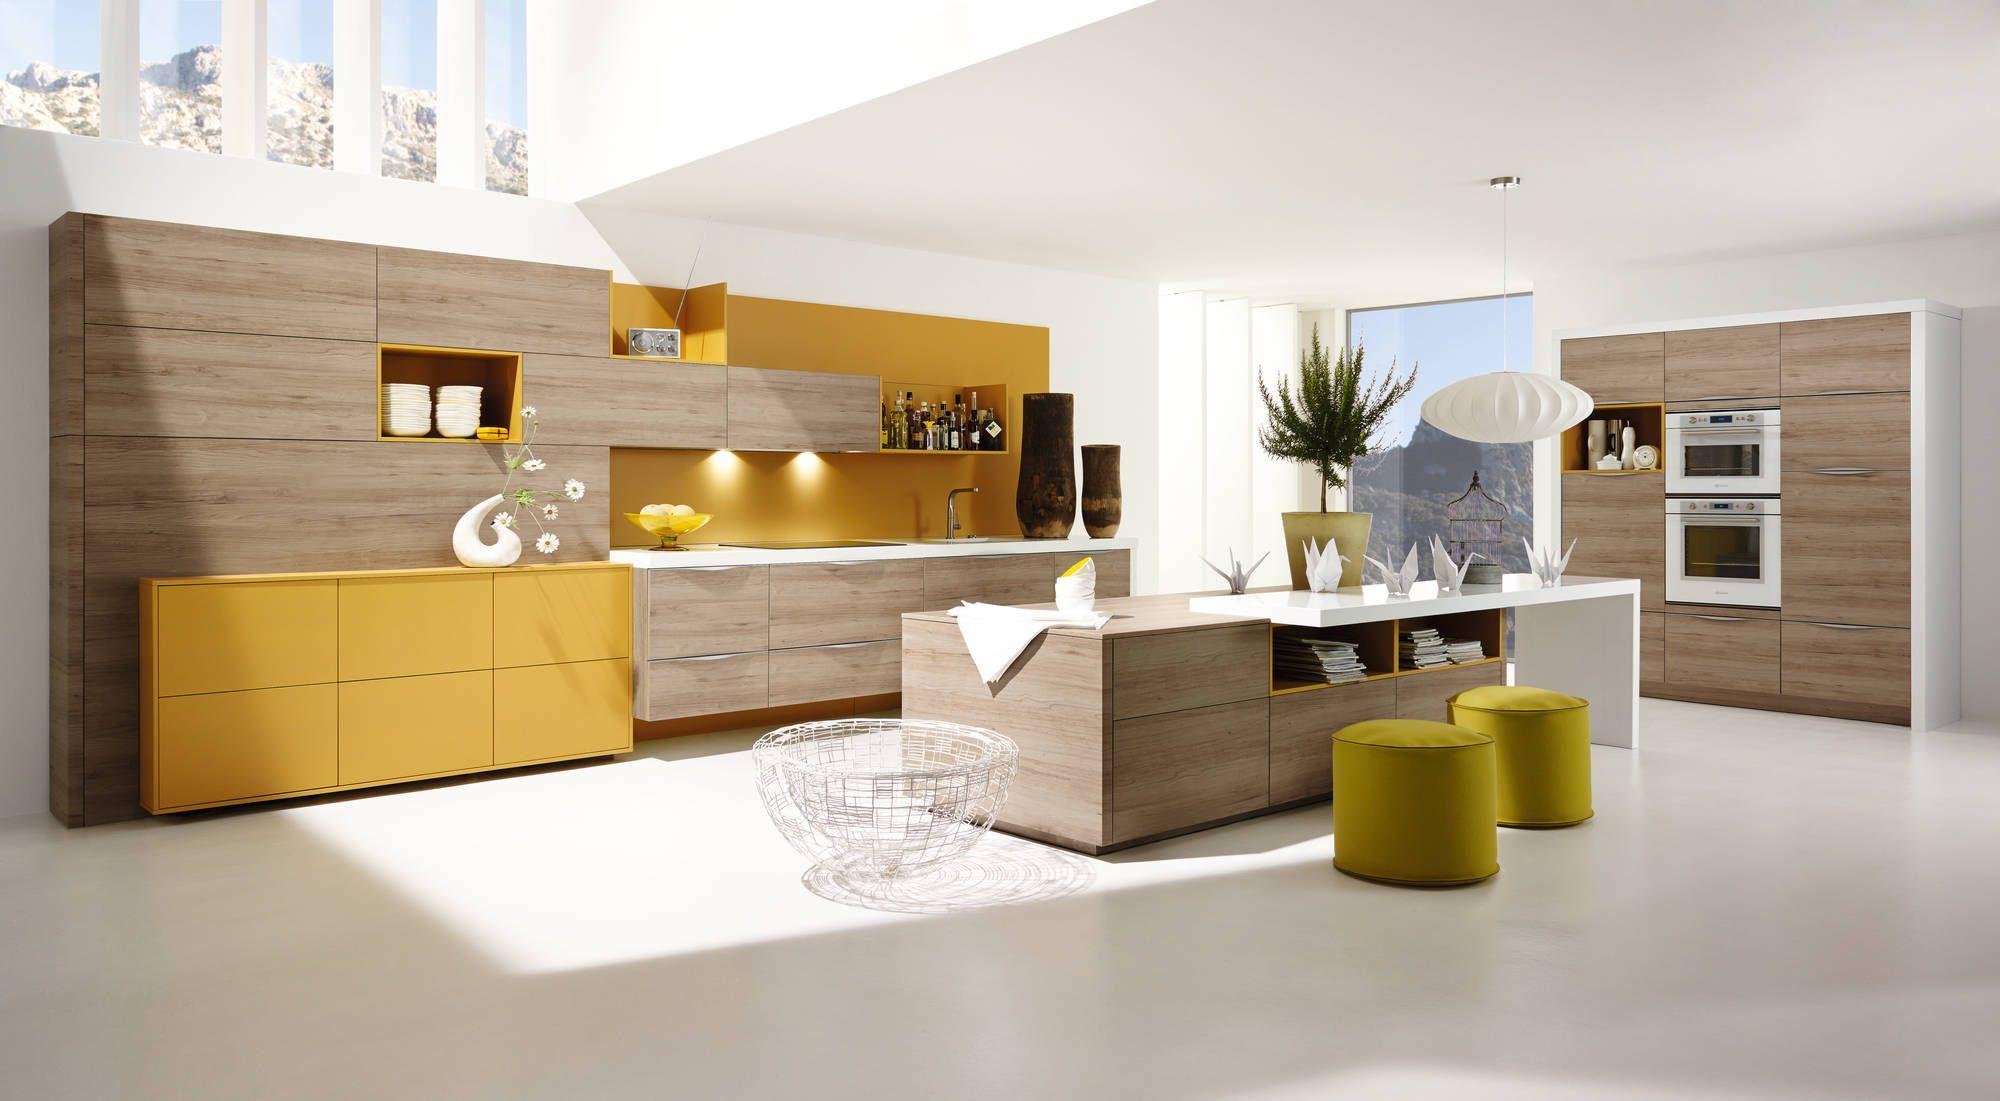 Яркие цвета на кухнях! alno impulse   Яркие кухни   pinterest   Шкафы